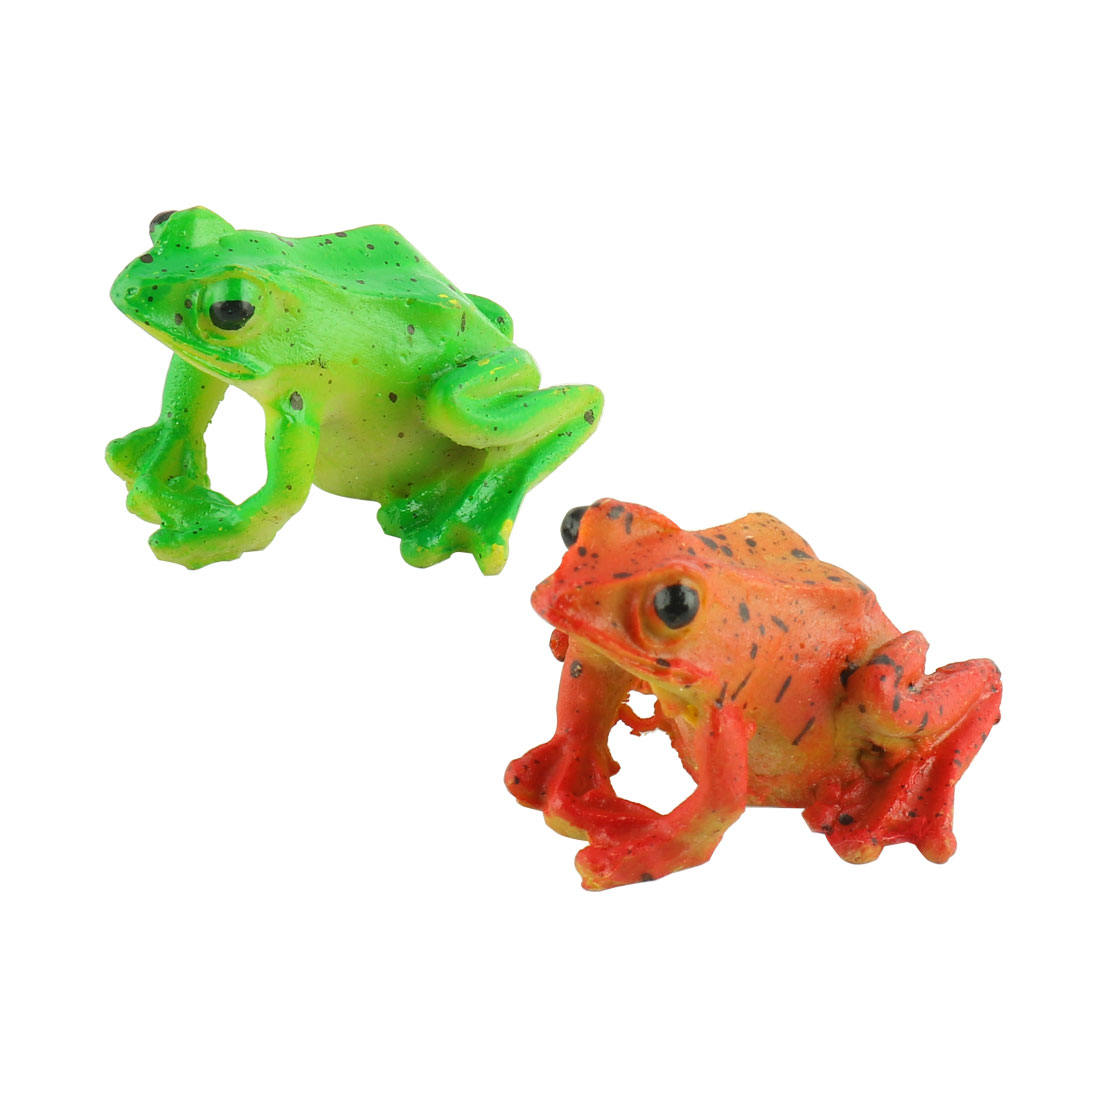 Aquarium Fish Tank Aquascaping Plastic Emulational Frog Shaped Decoration Orange Green 2pcs